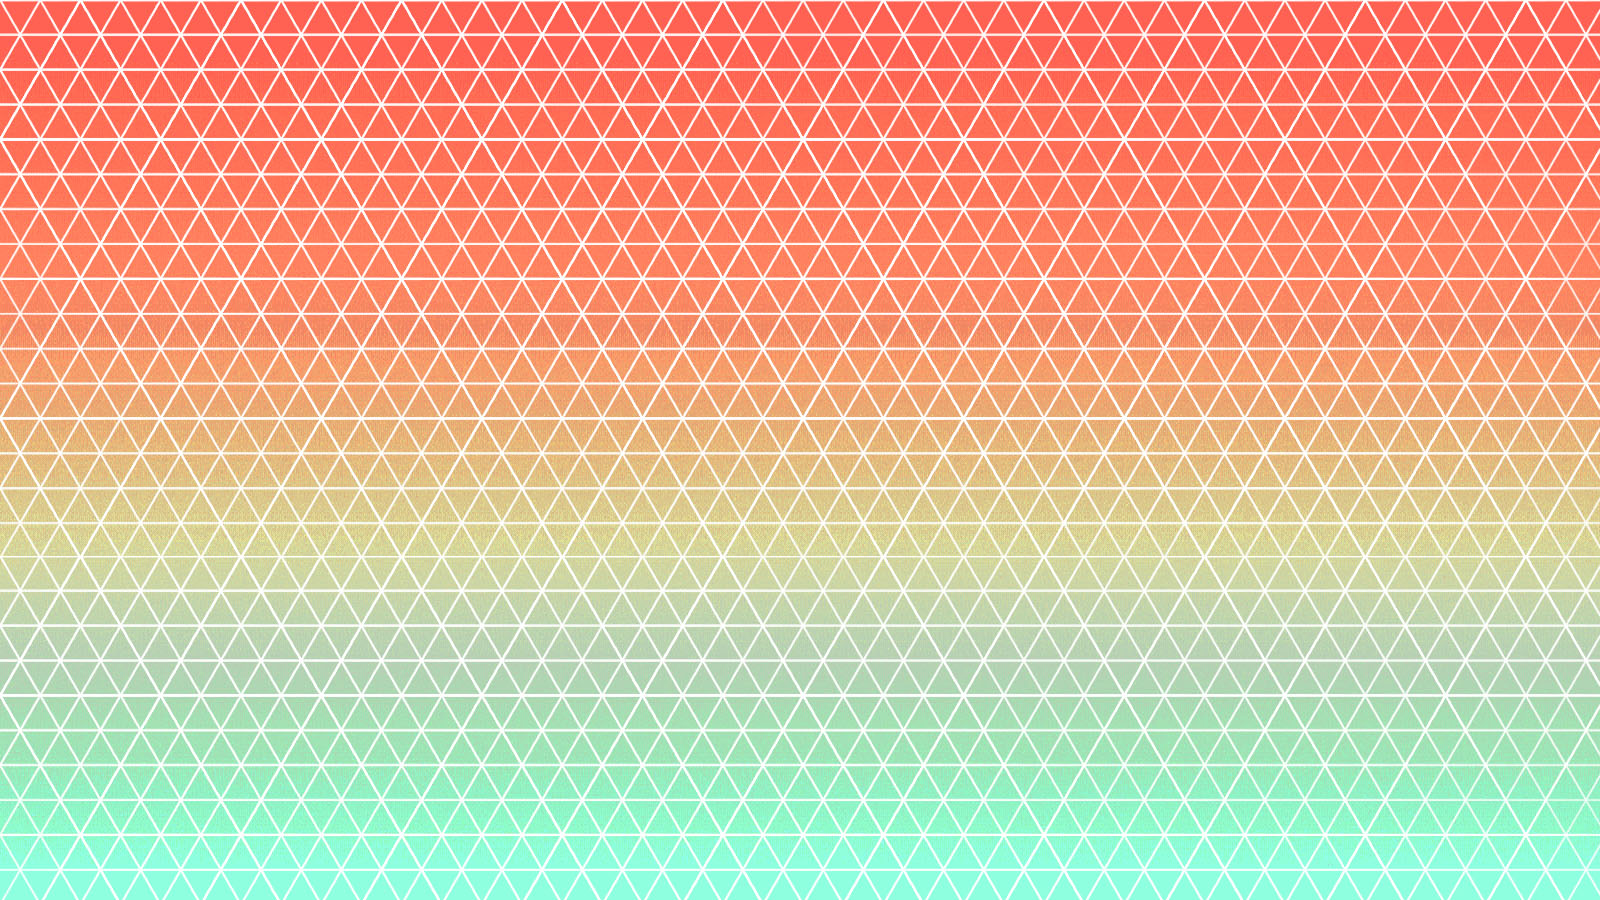 Cloud Grid Aesthetic Tumblr Www Topsimages Com